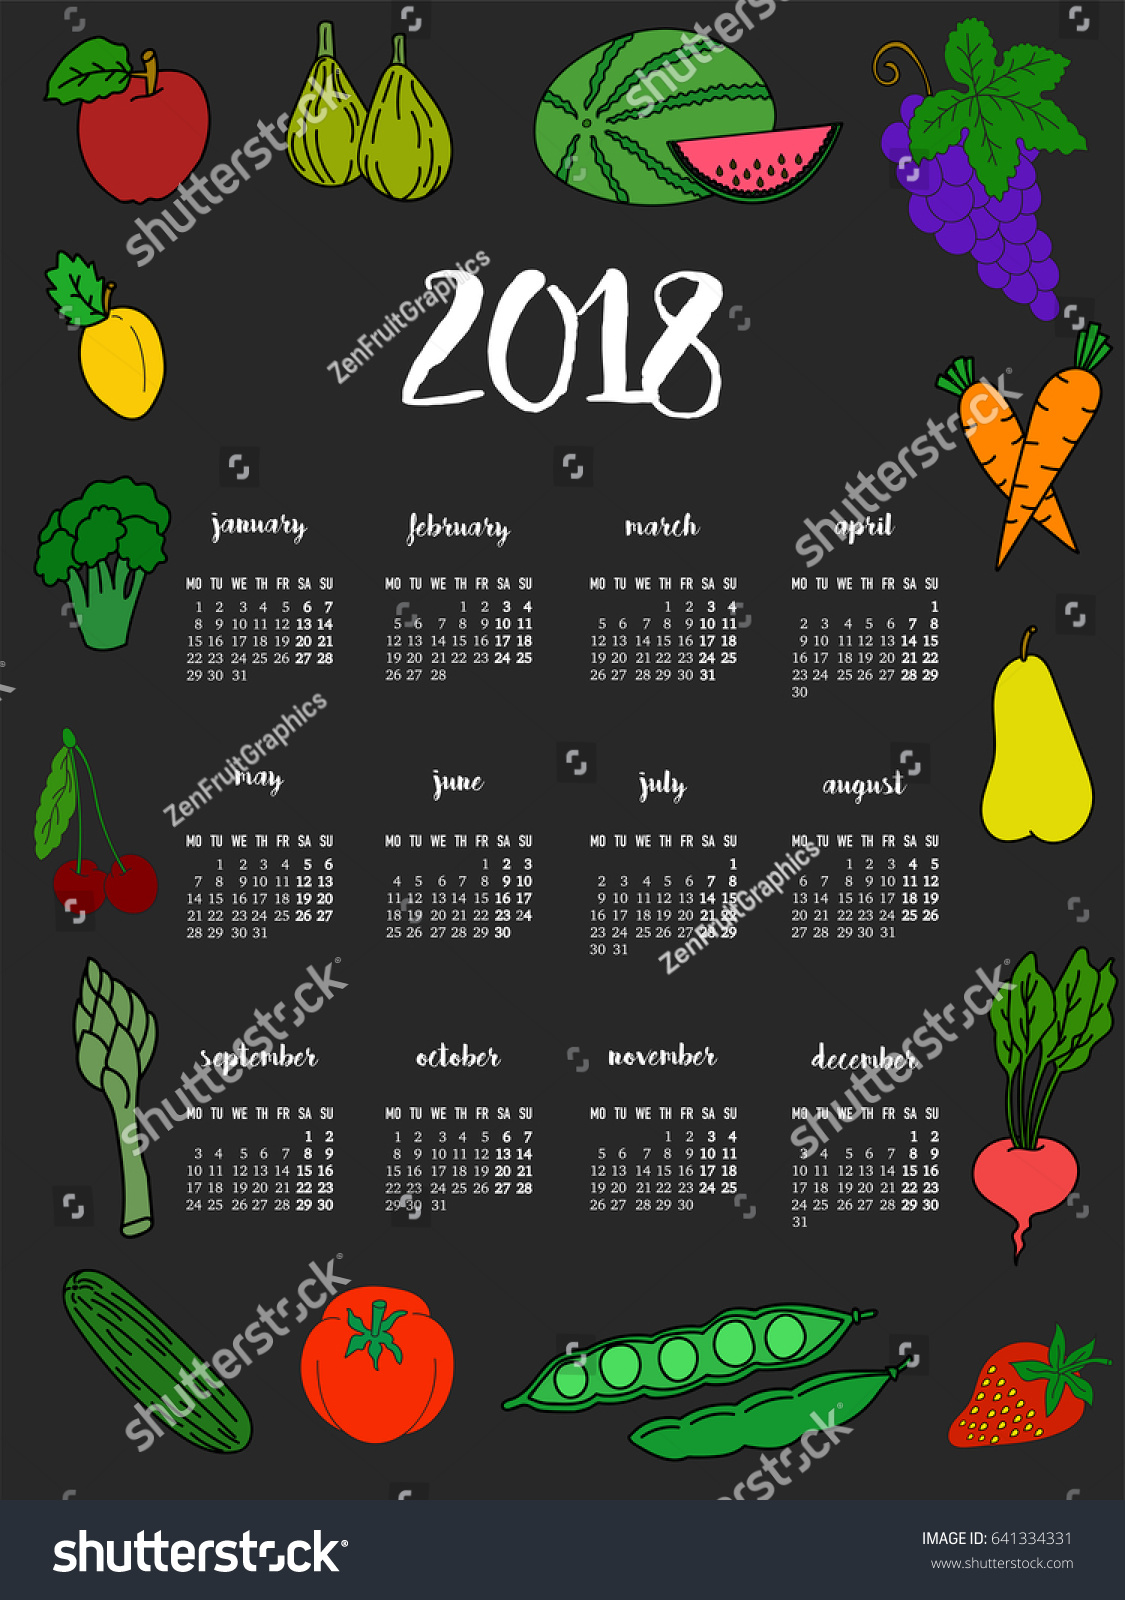 Kitchen Calendar Design : Kitchen calendar design template stock